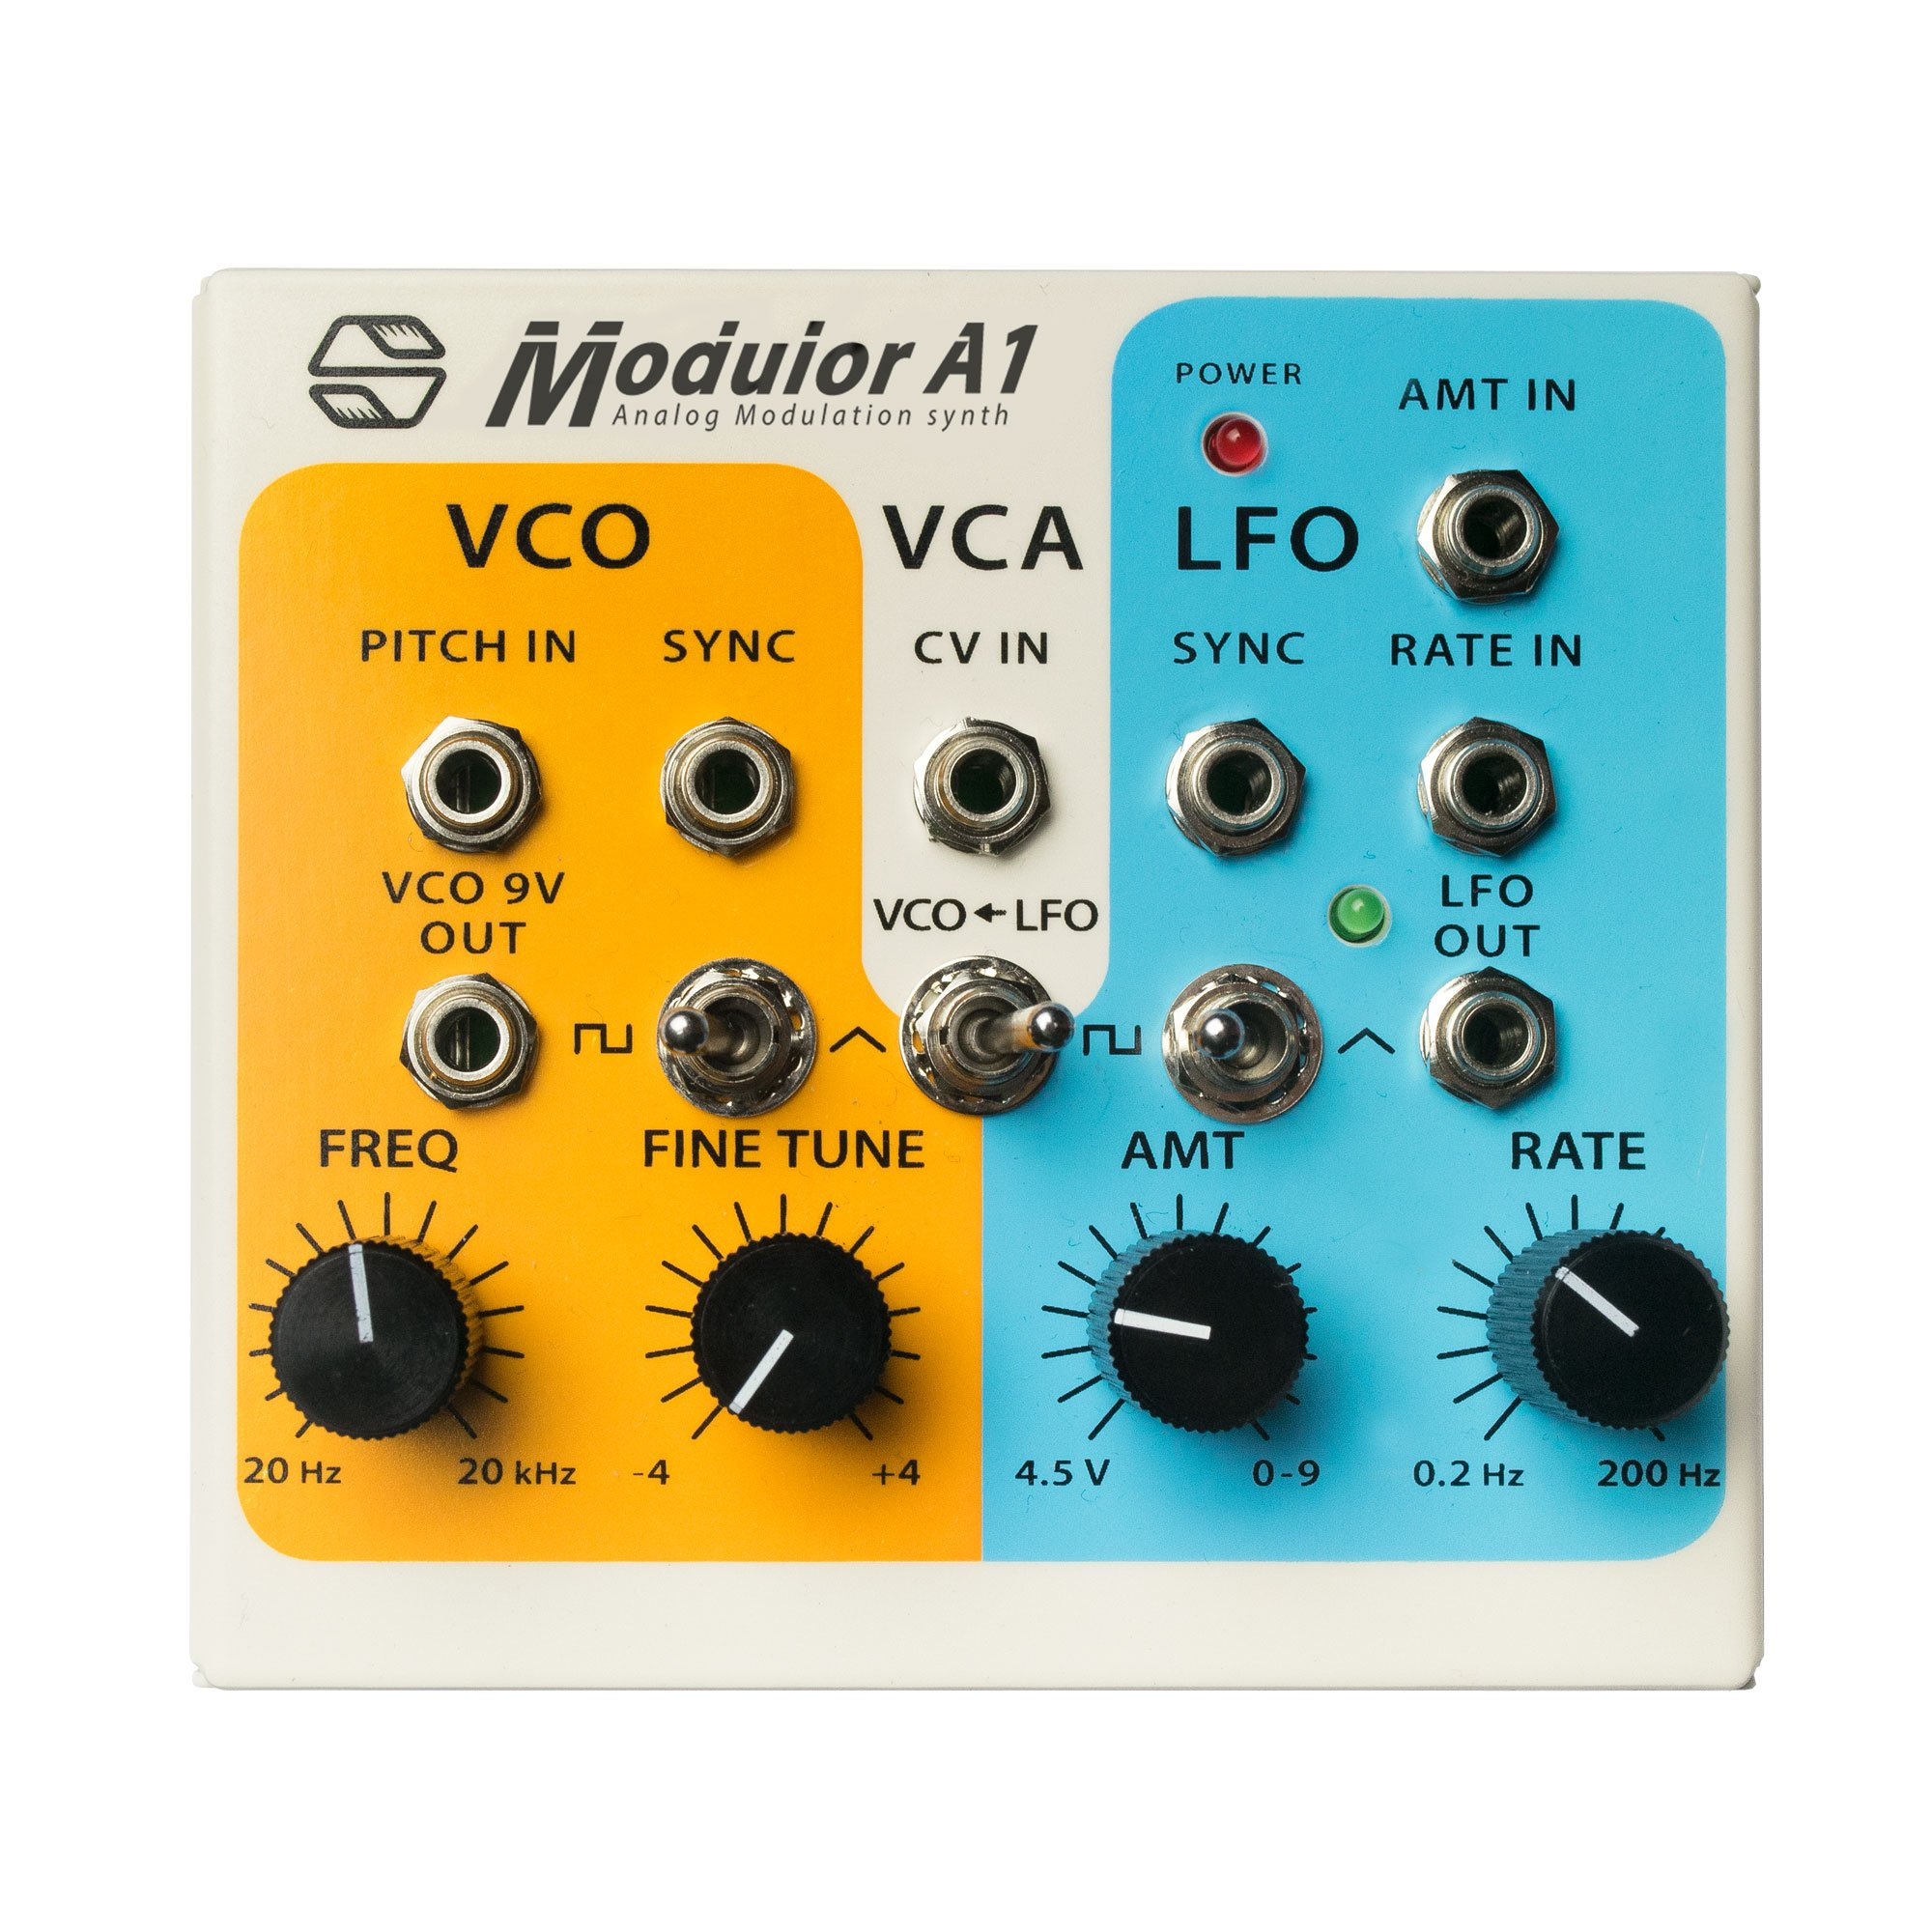 Modulor A1 : Semi-Modulor Analog Modulation Synthesizer